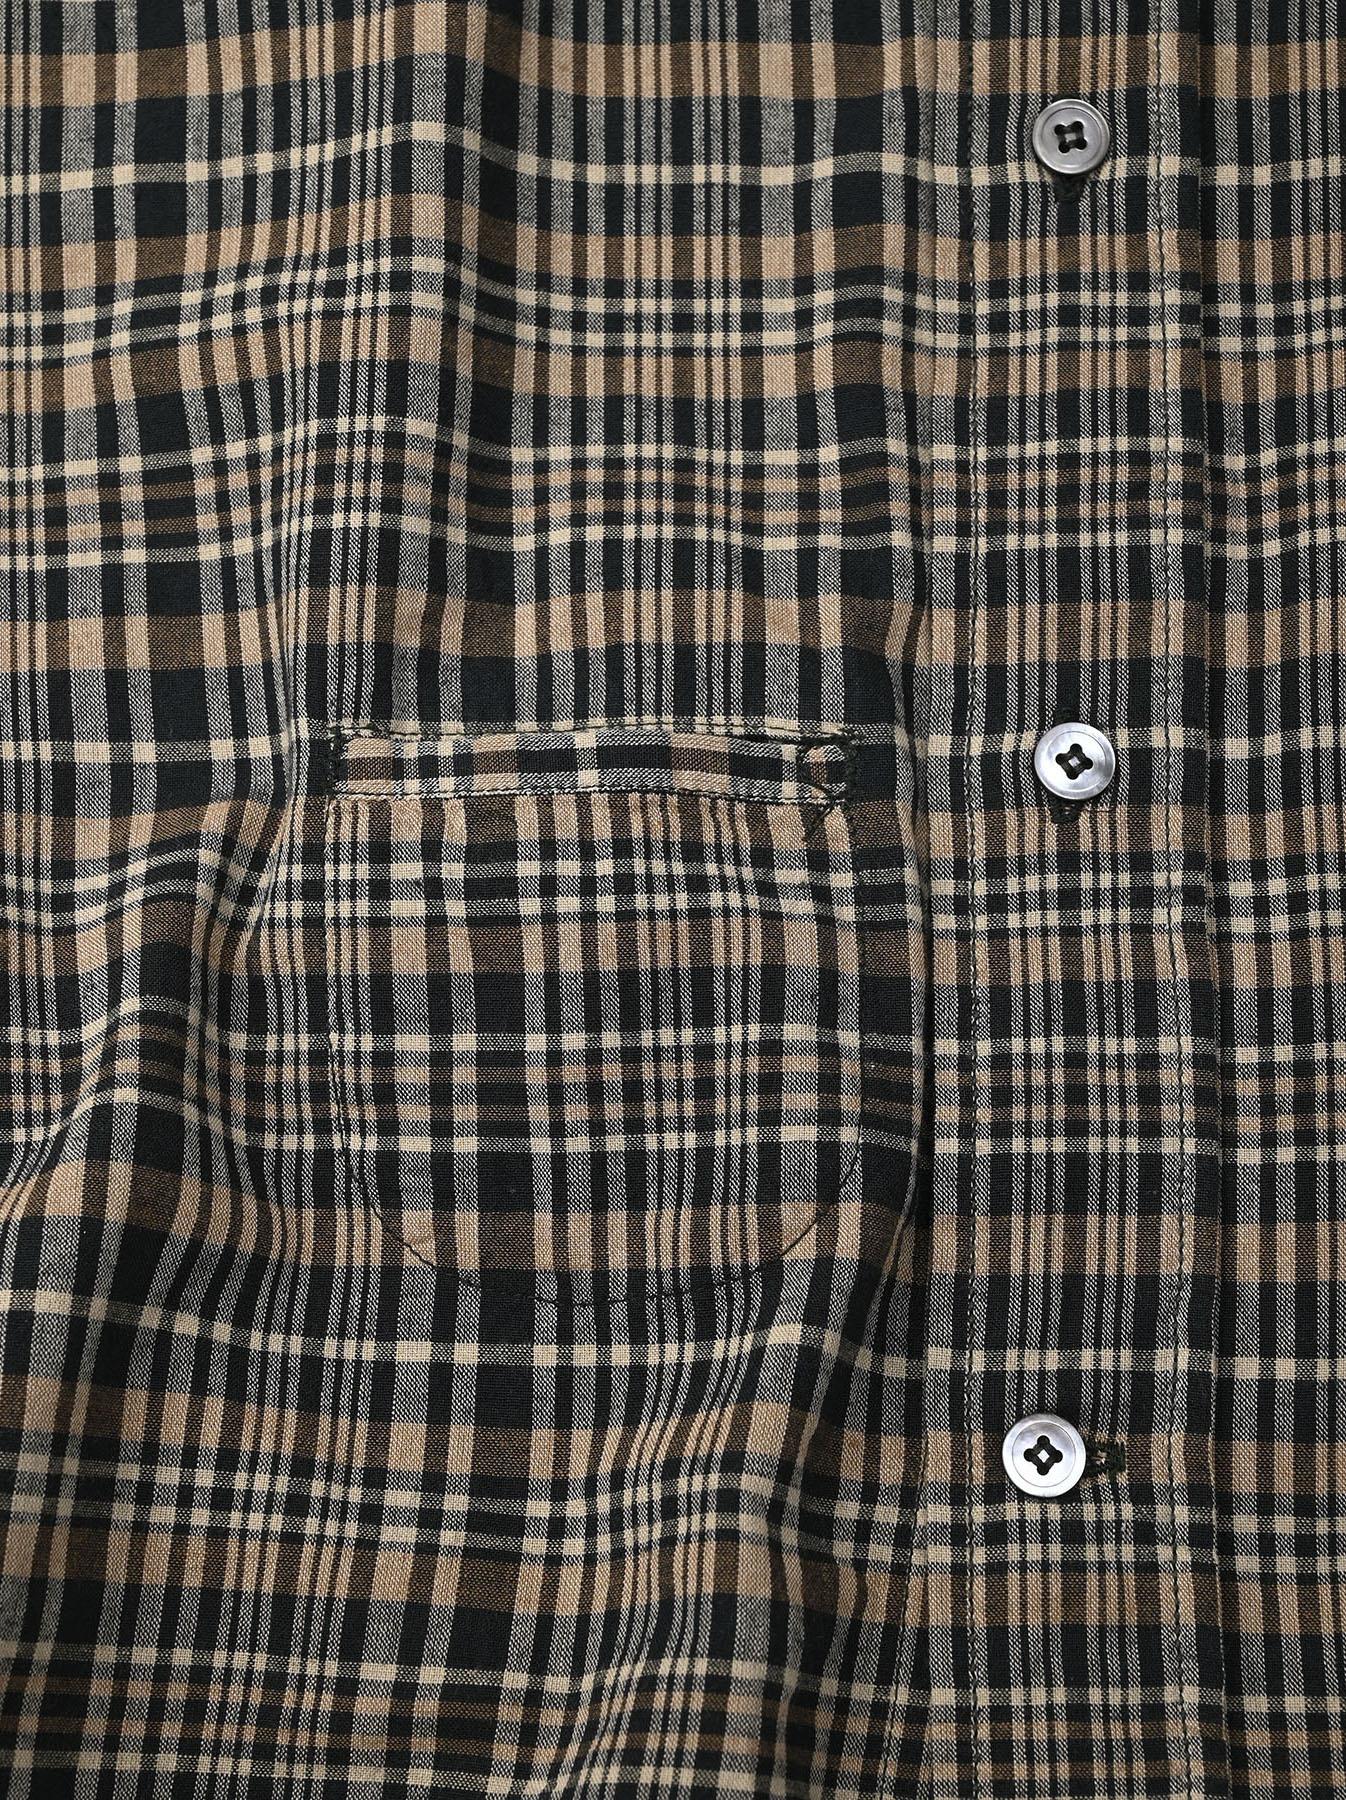 Indian Mugi-hira 908 Ocean Button Down Shirt (0421)-11